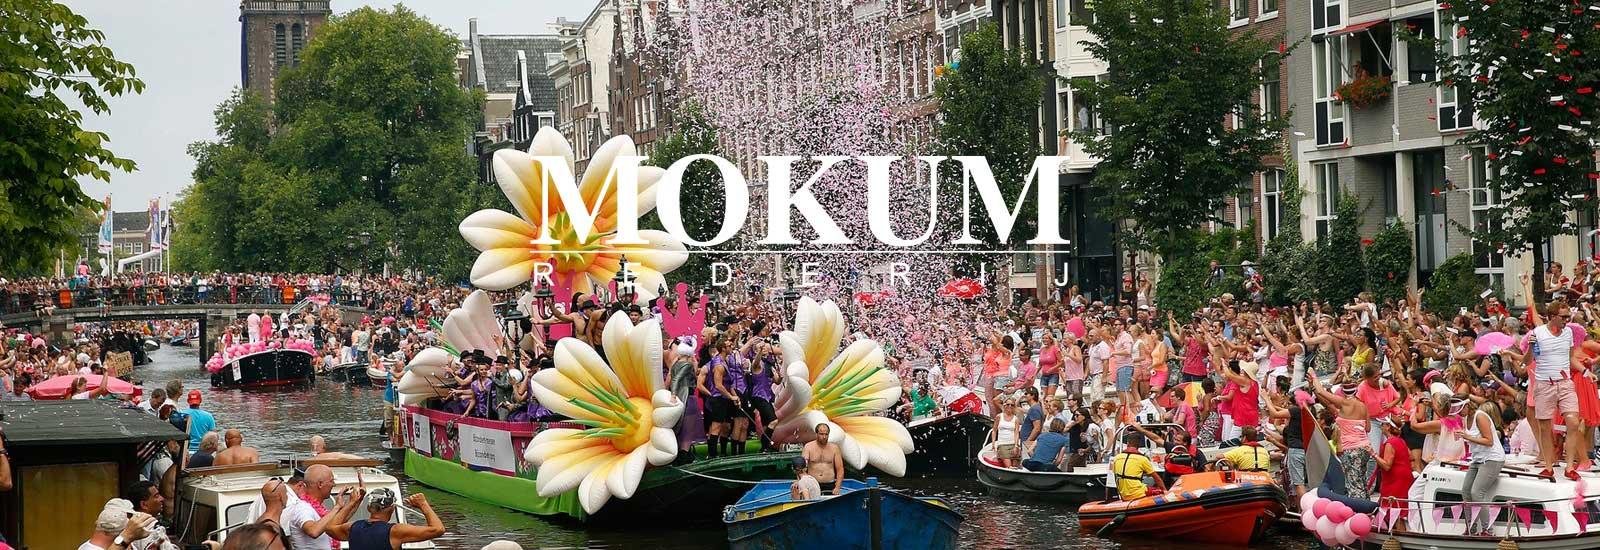 gay pride boot huren Amsterdam